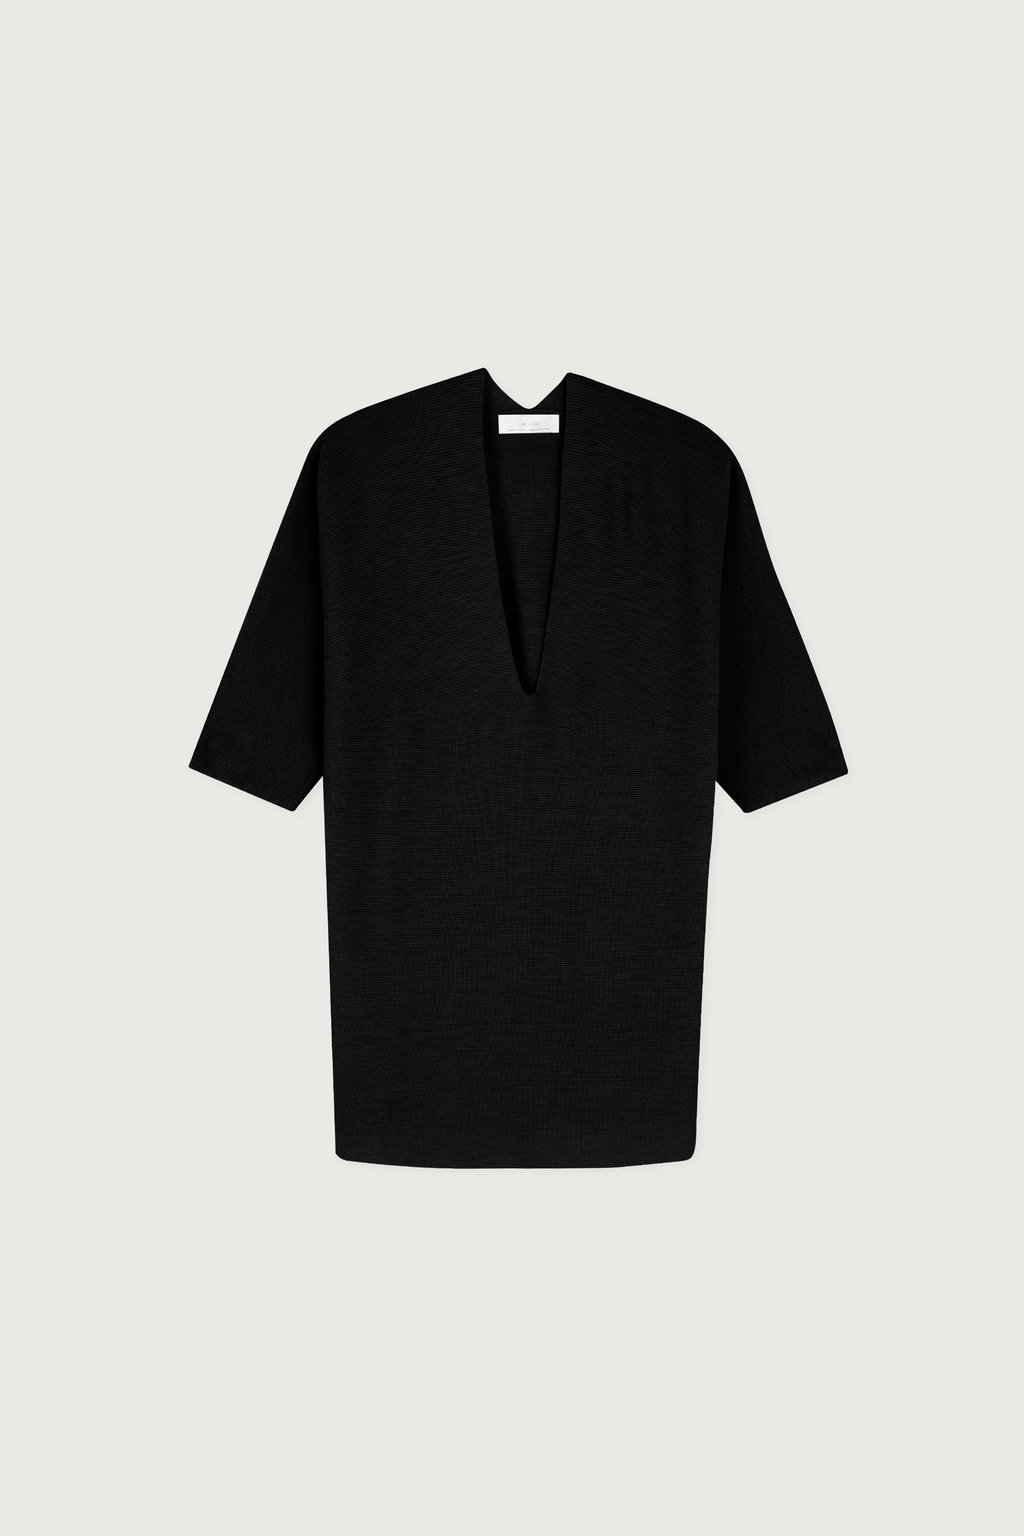 Sweater 21112019 Black 9